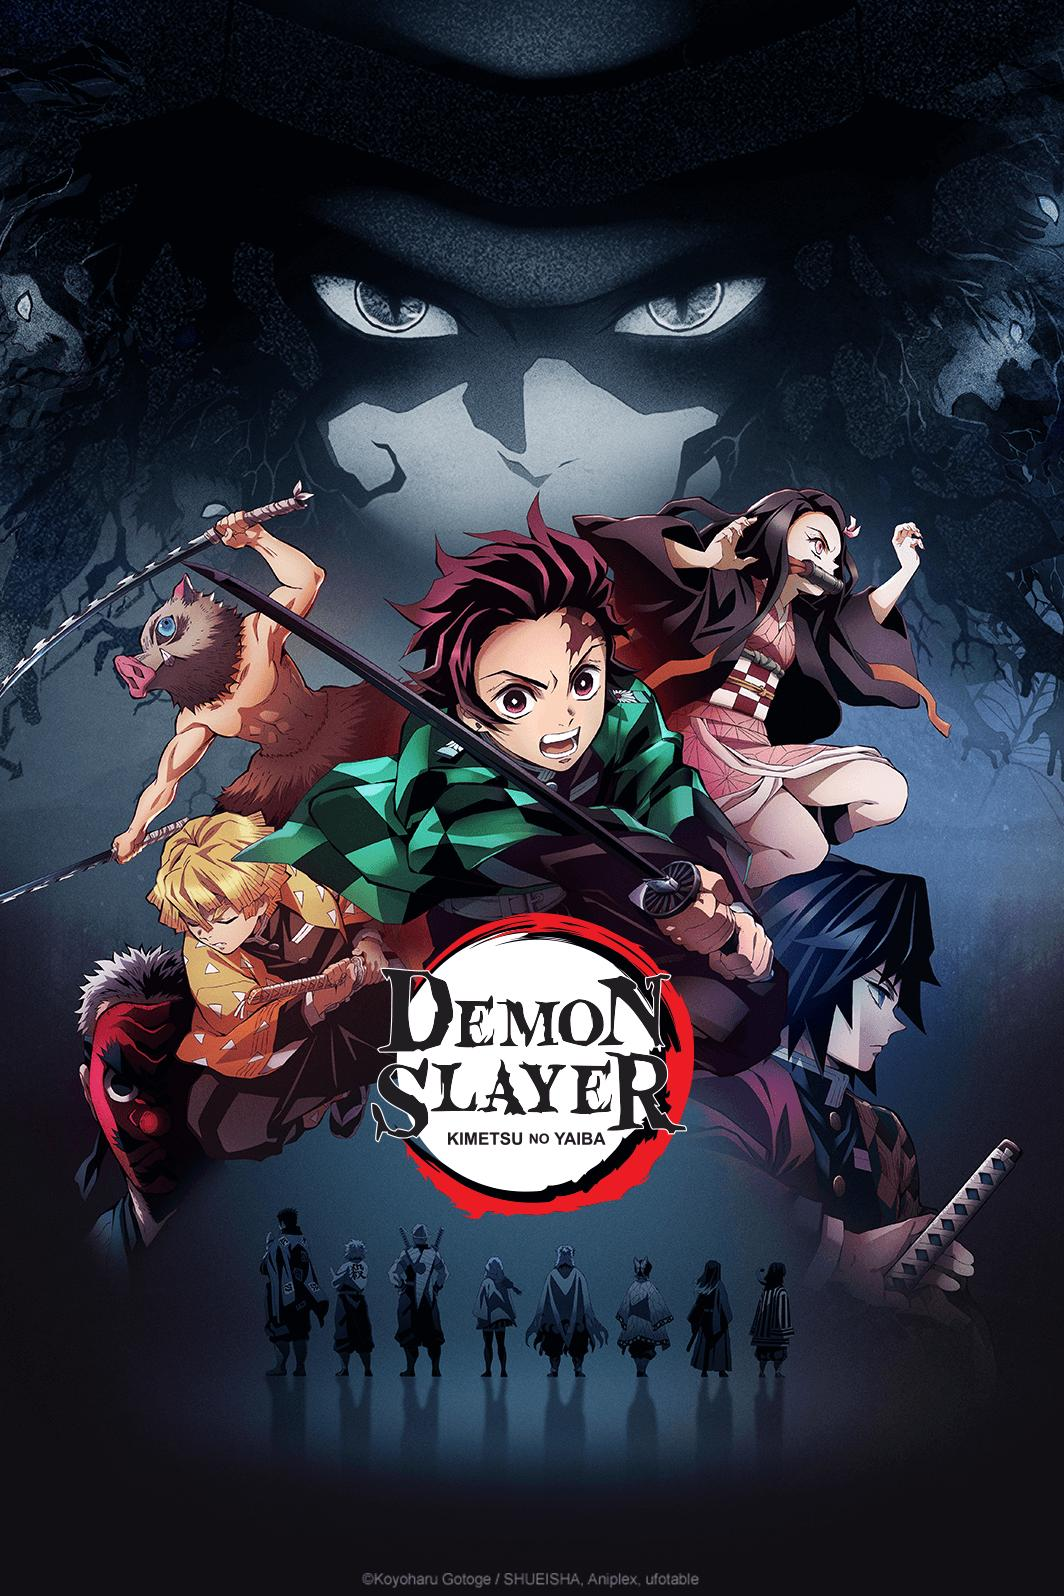 Demon Slayer: Kimetsu no Yaiba - Watch on Crunchyroll